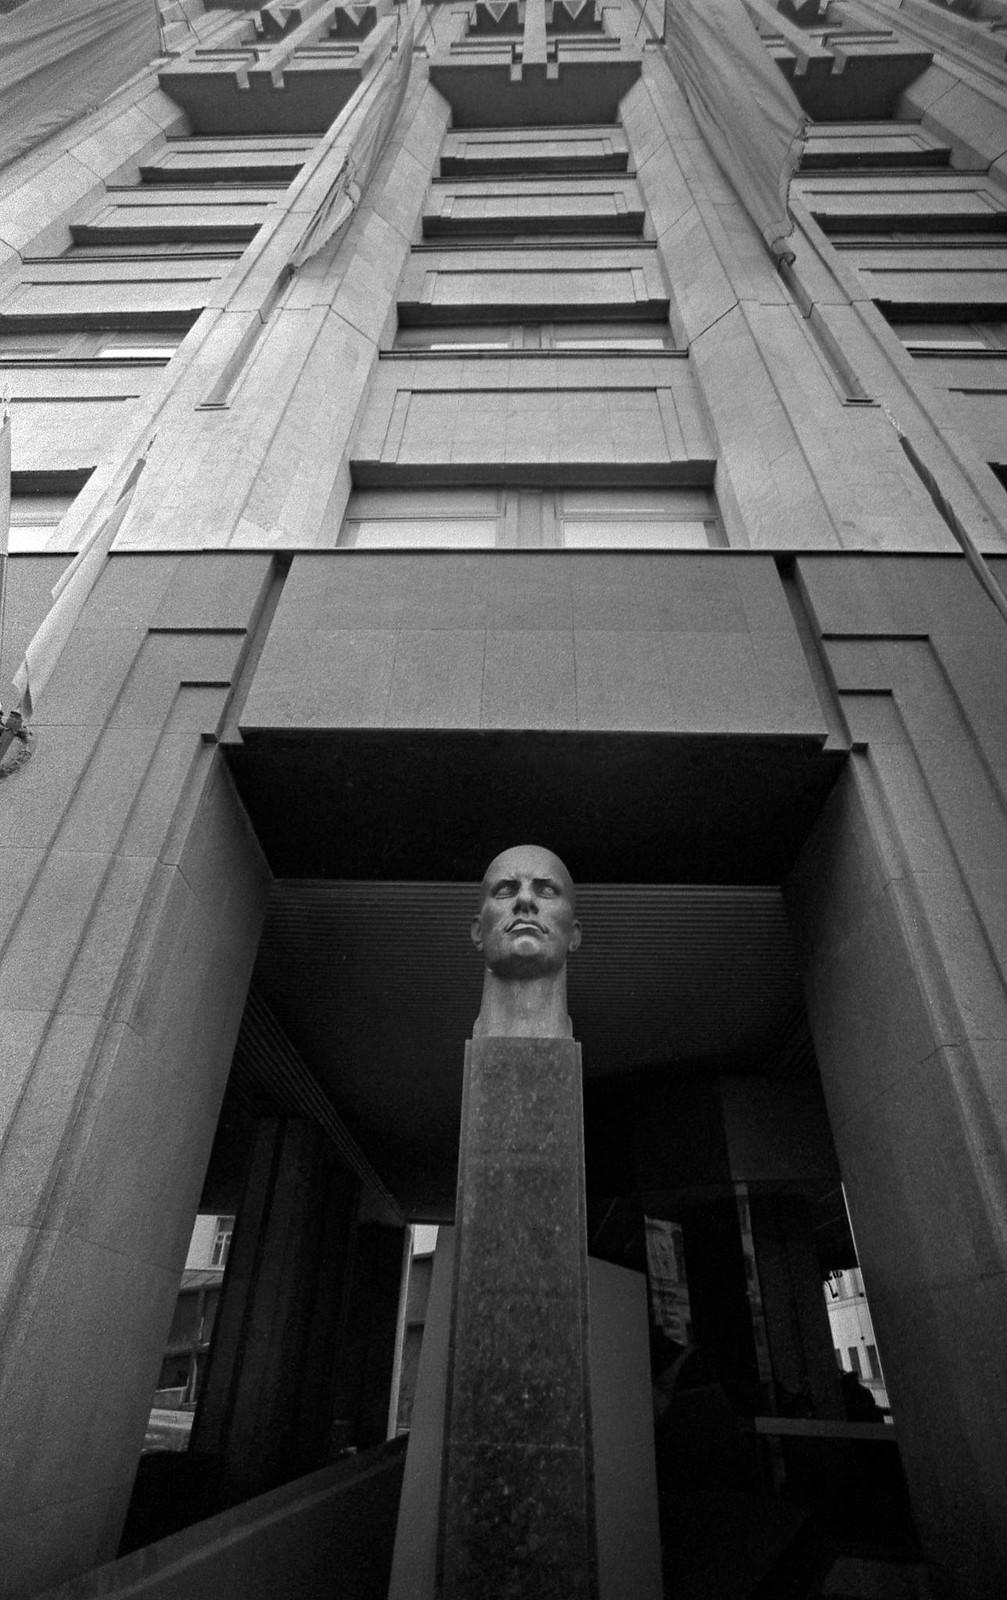 1985. Бюст Владимира Владимировича Маяковского перед входом в музей В. В. Маяковского на Лубянской площади